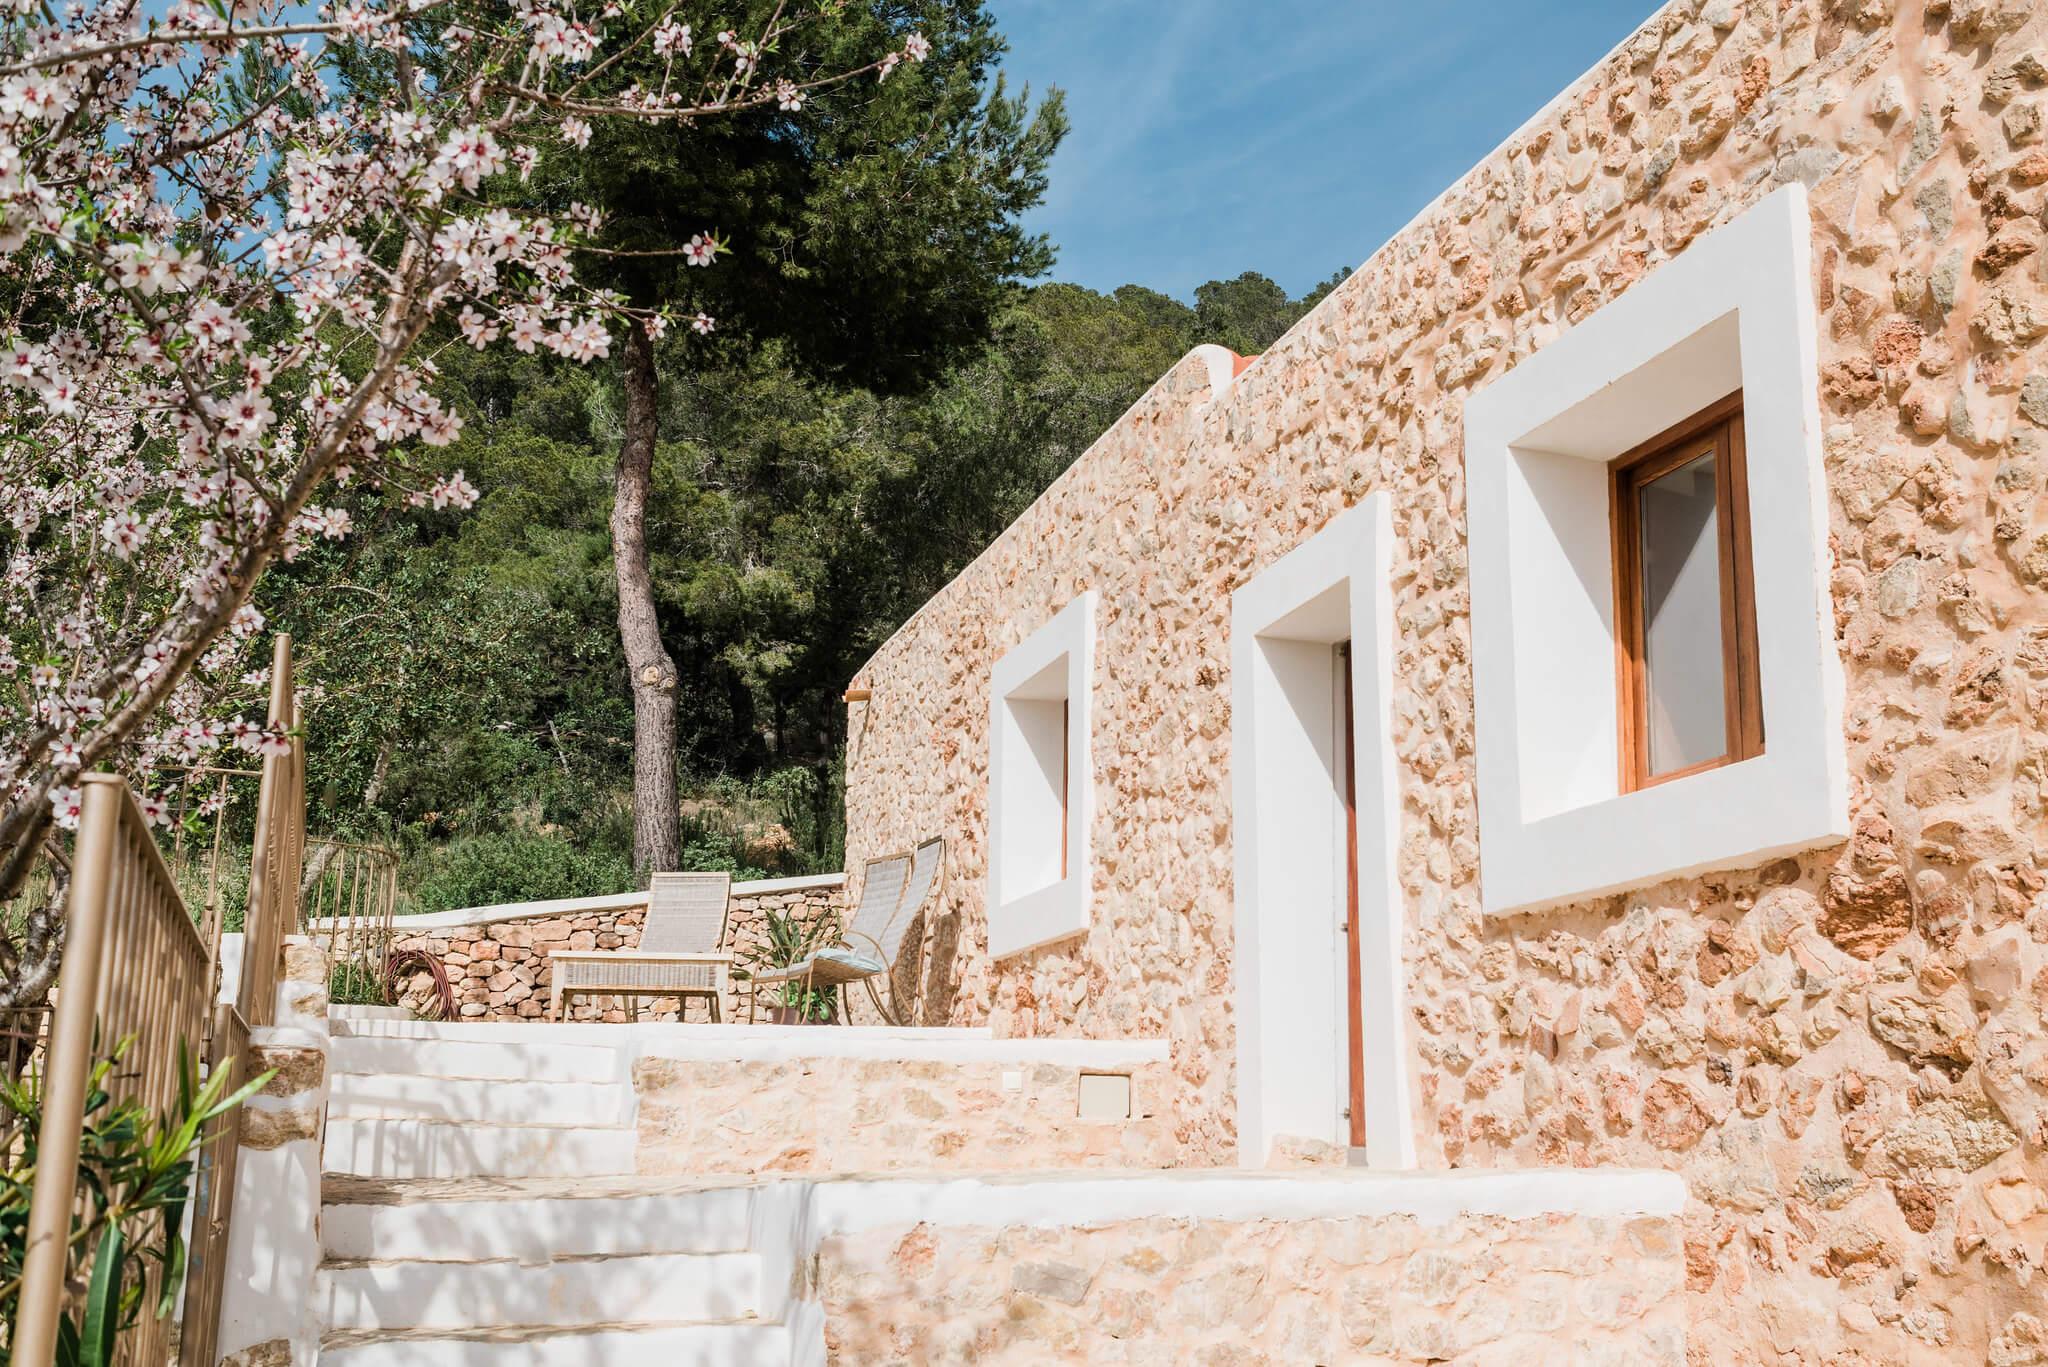 https://www.white-ibiza.com/wp-content/uploads/2020/06/white-ibiza-villas-los-corrales-exterior-steps.jpg